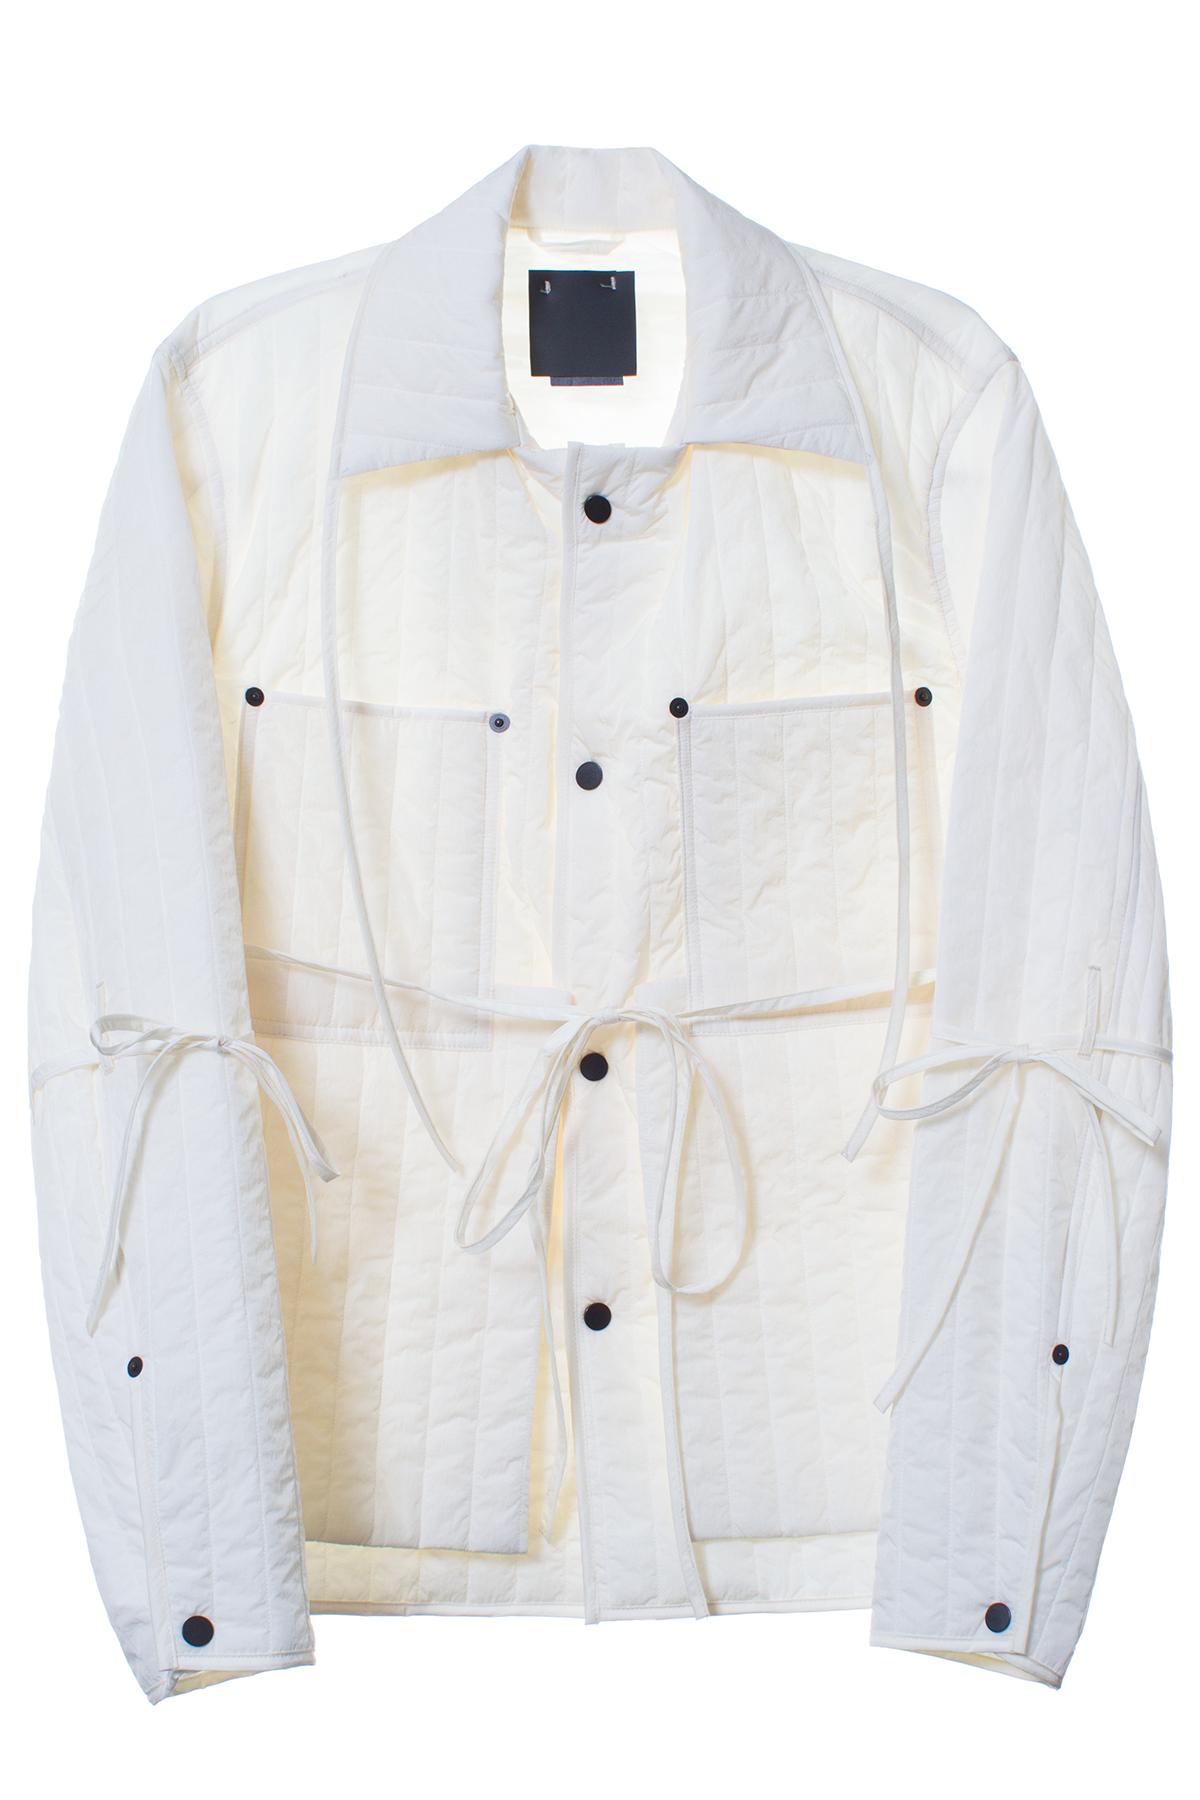 Quilted Workwear Jacket Craiggreen Vfiles Shop Jackets Work Wear Fashion